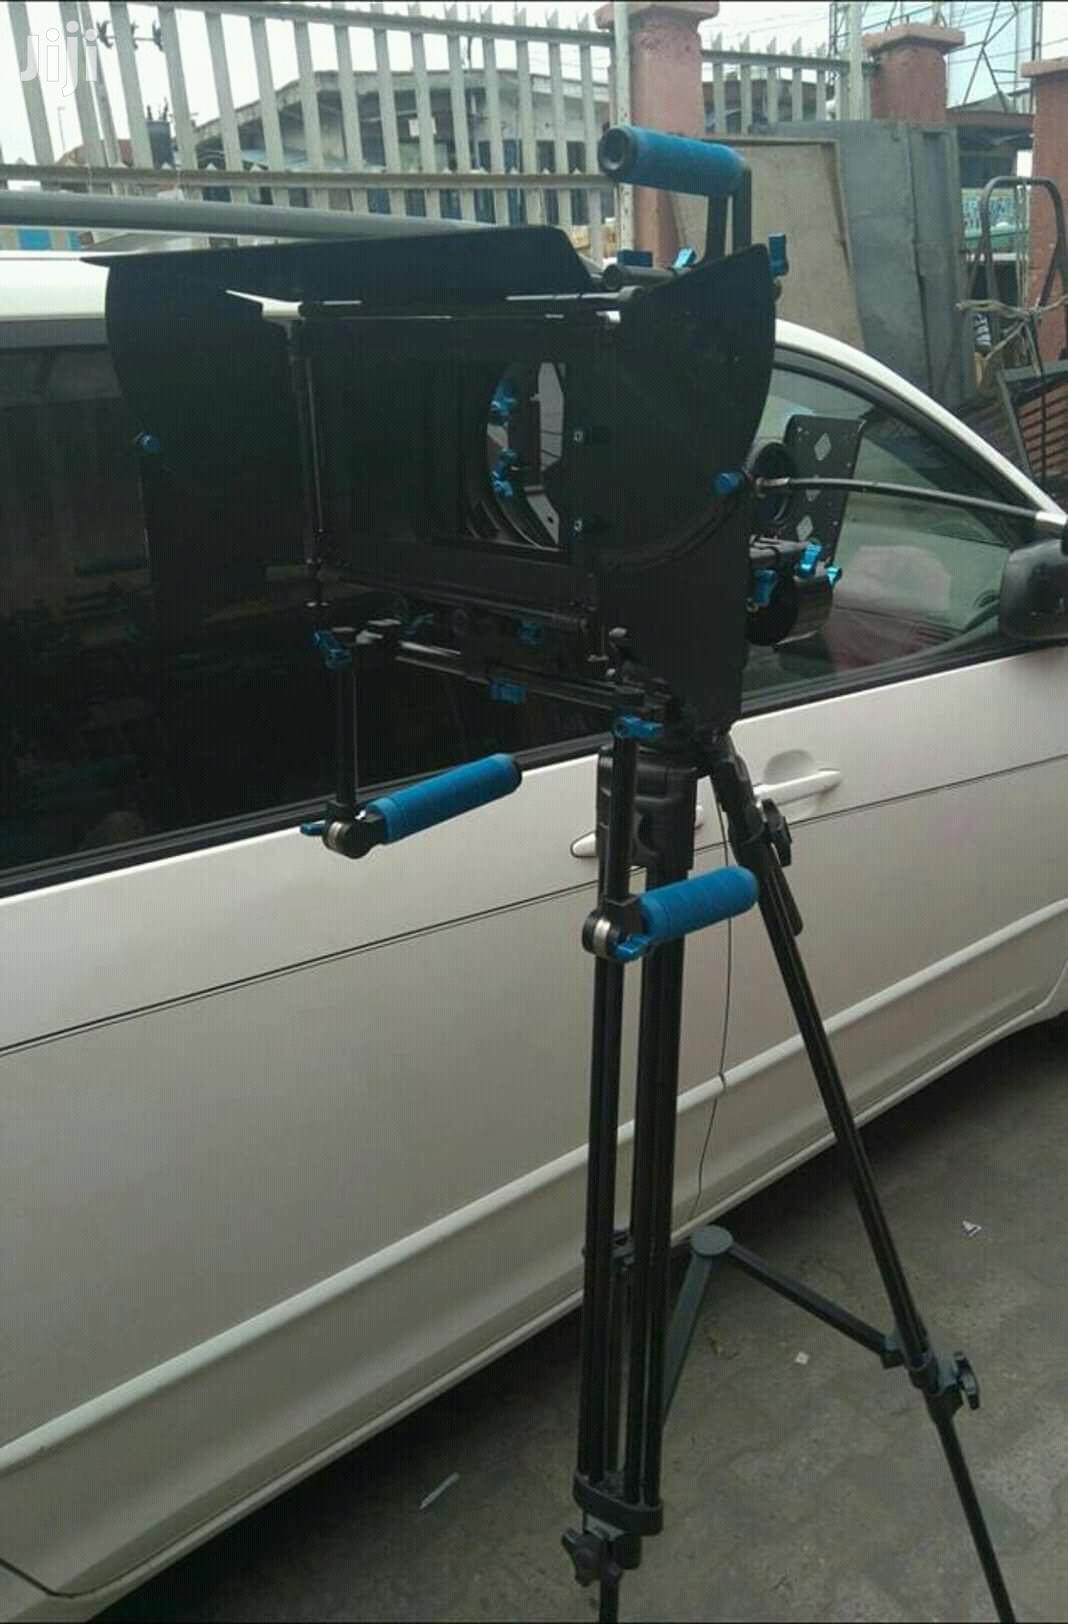 Matte Box For Digital Cameras   Photo & Video Cameras for sale in Ojo, Lagos State, Nigeria